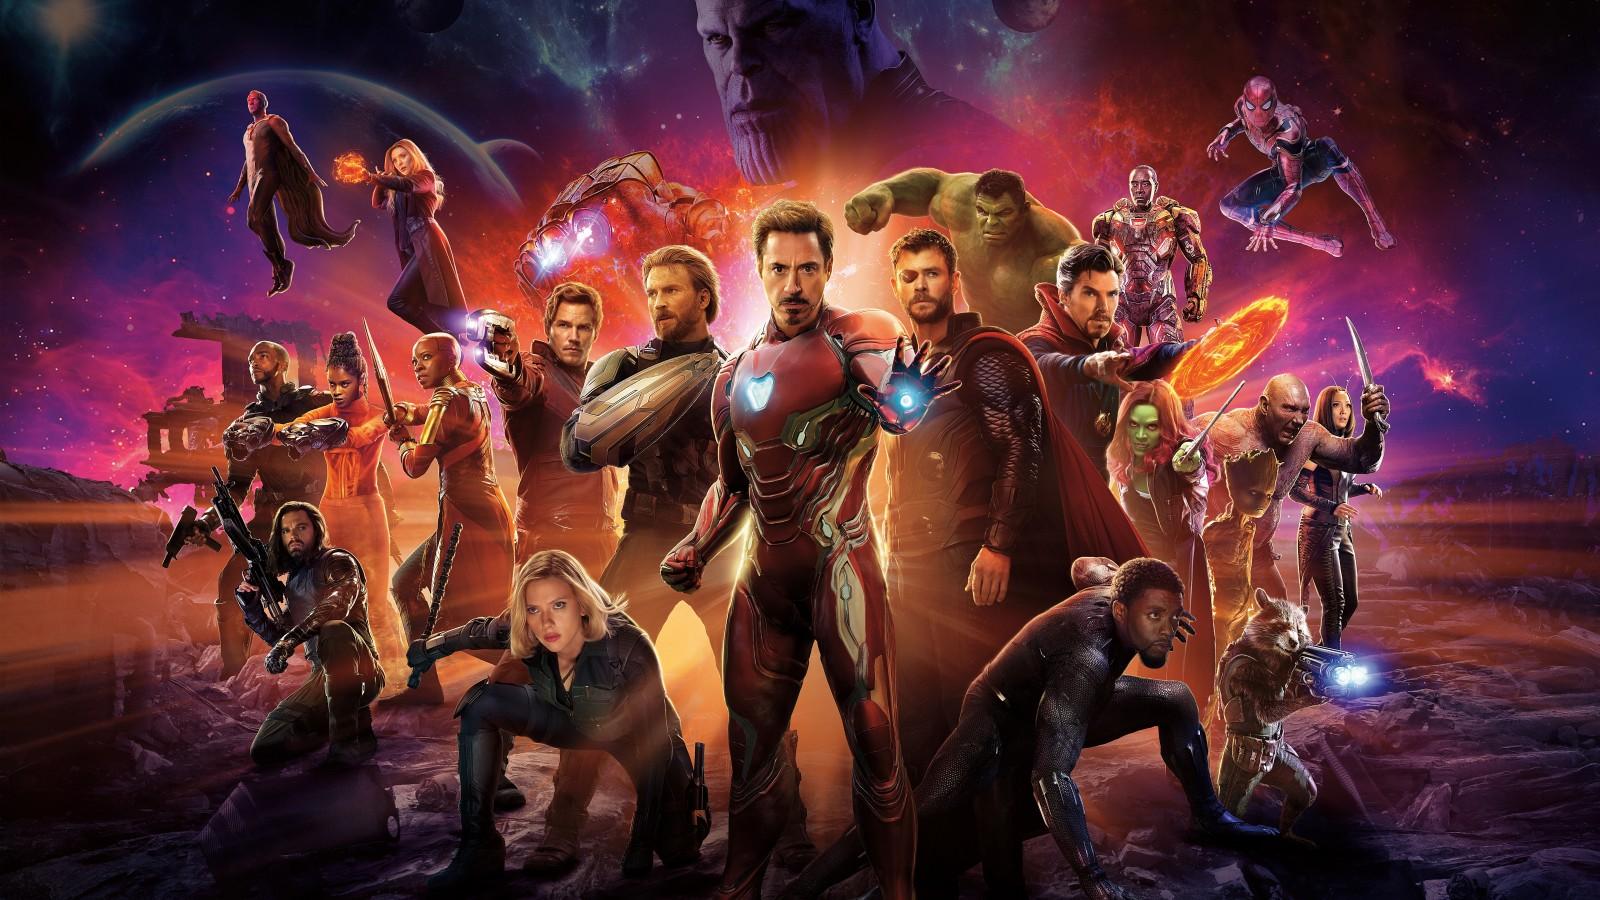 Superman Iphone 5 Wallpaper Avengers Infinity War Superheroes Cast 4k 8k Wallpapers